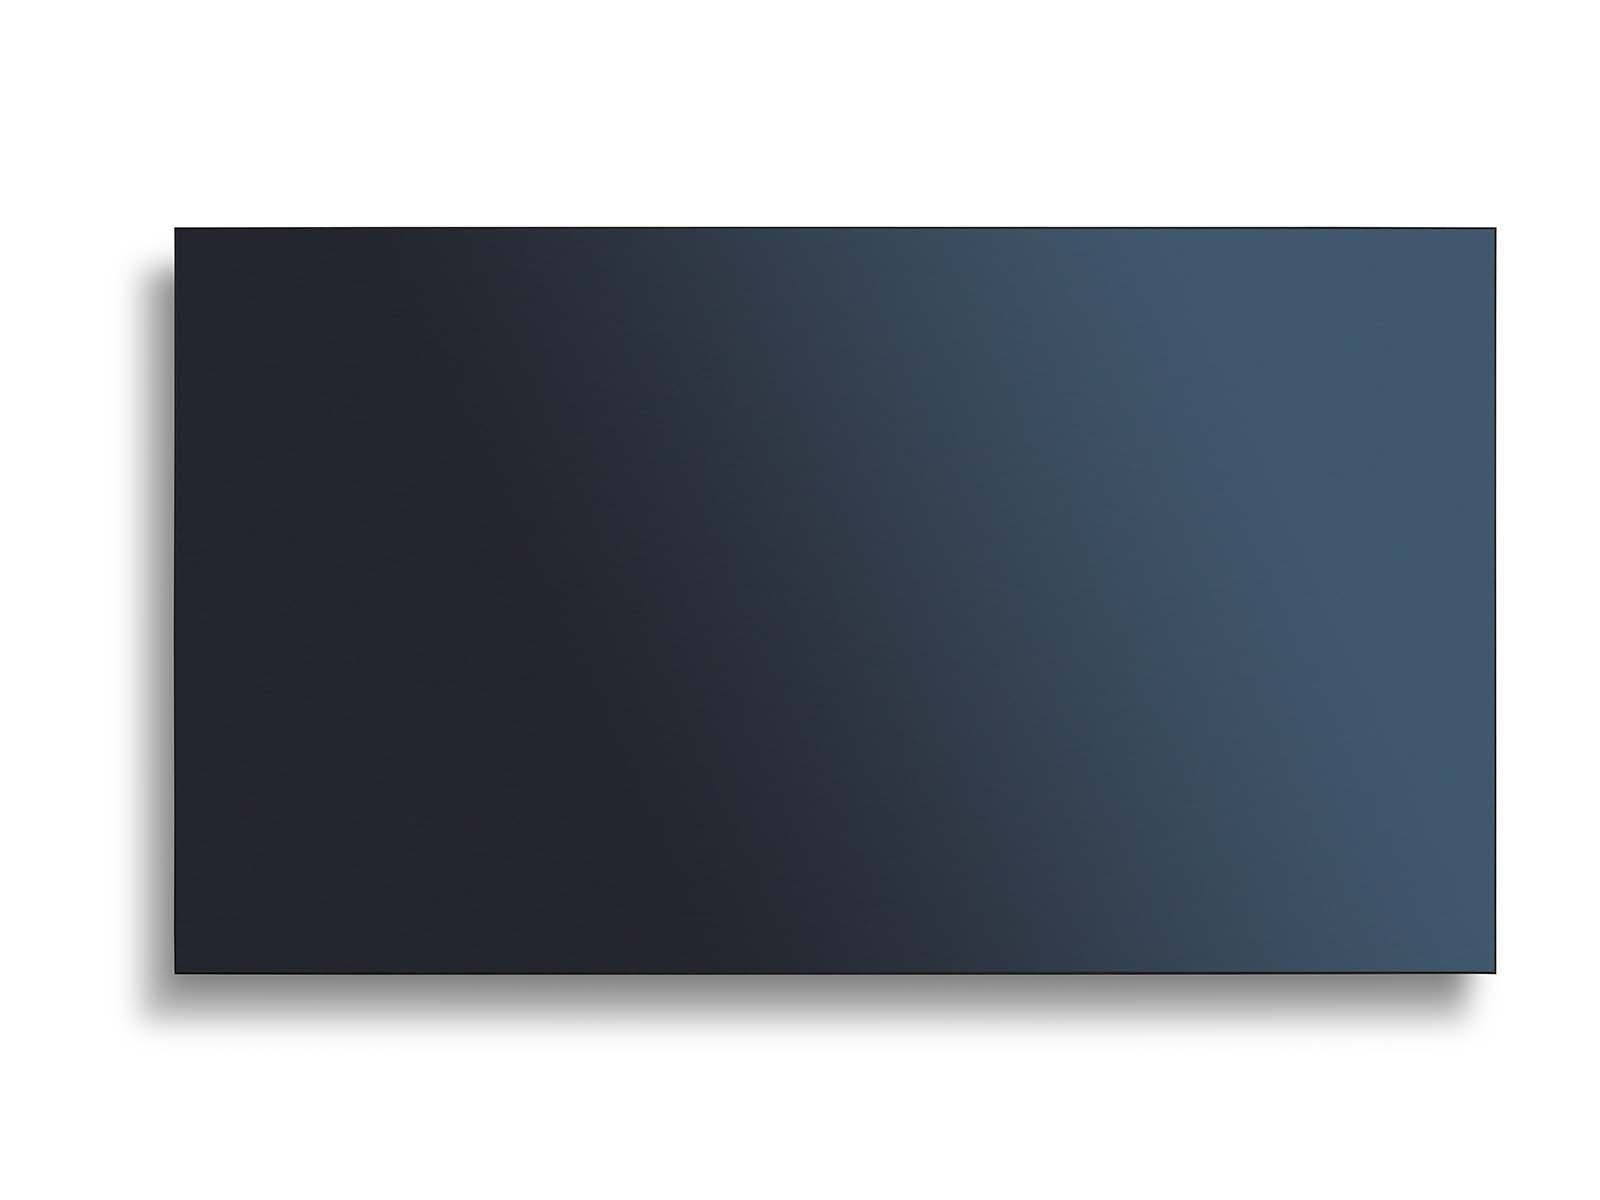 NEC MultiSync UN551S 55'' LED Full HD Black